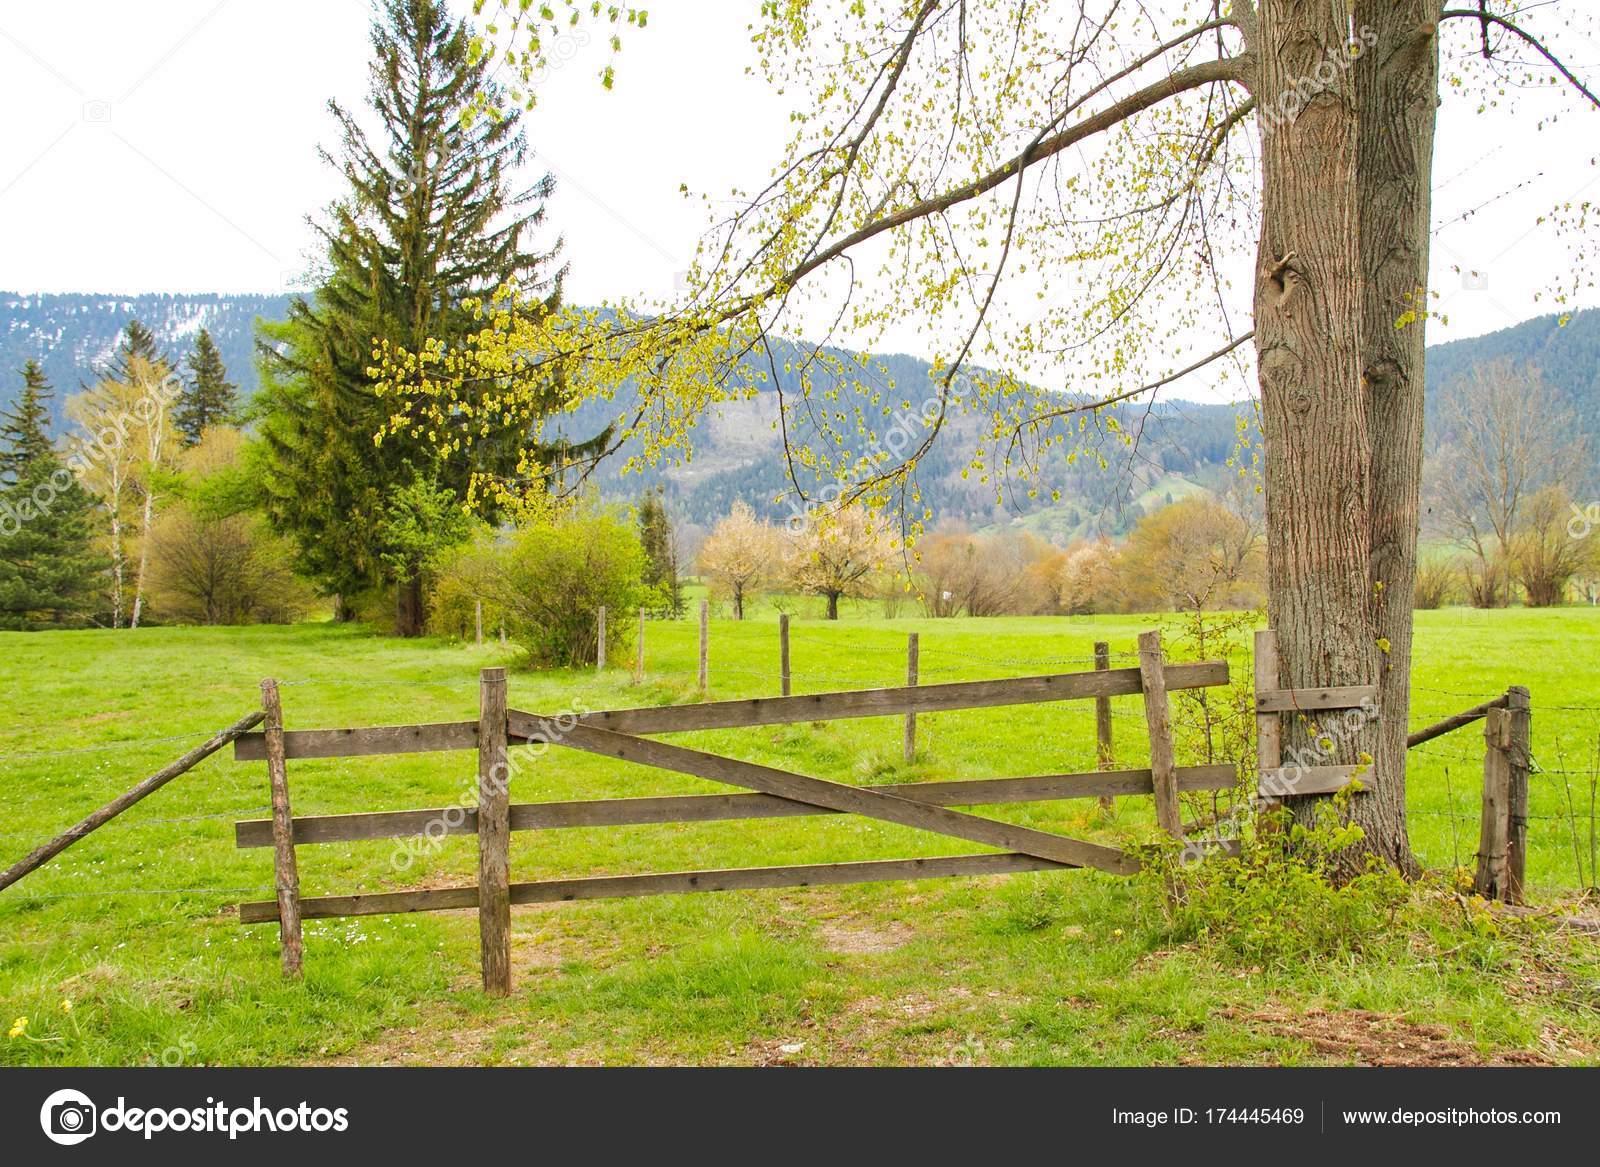 bauernhof zaun mit weide — stockfoto © jasony00 #174445469